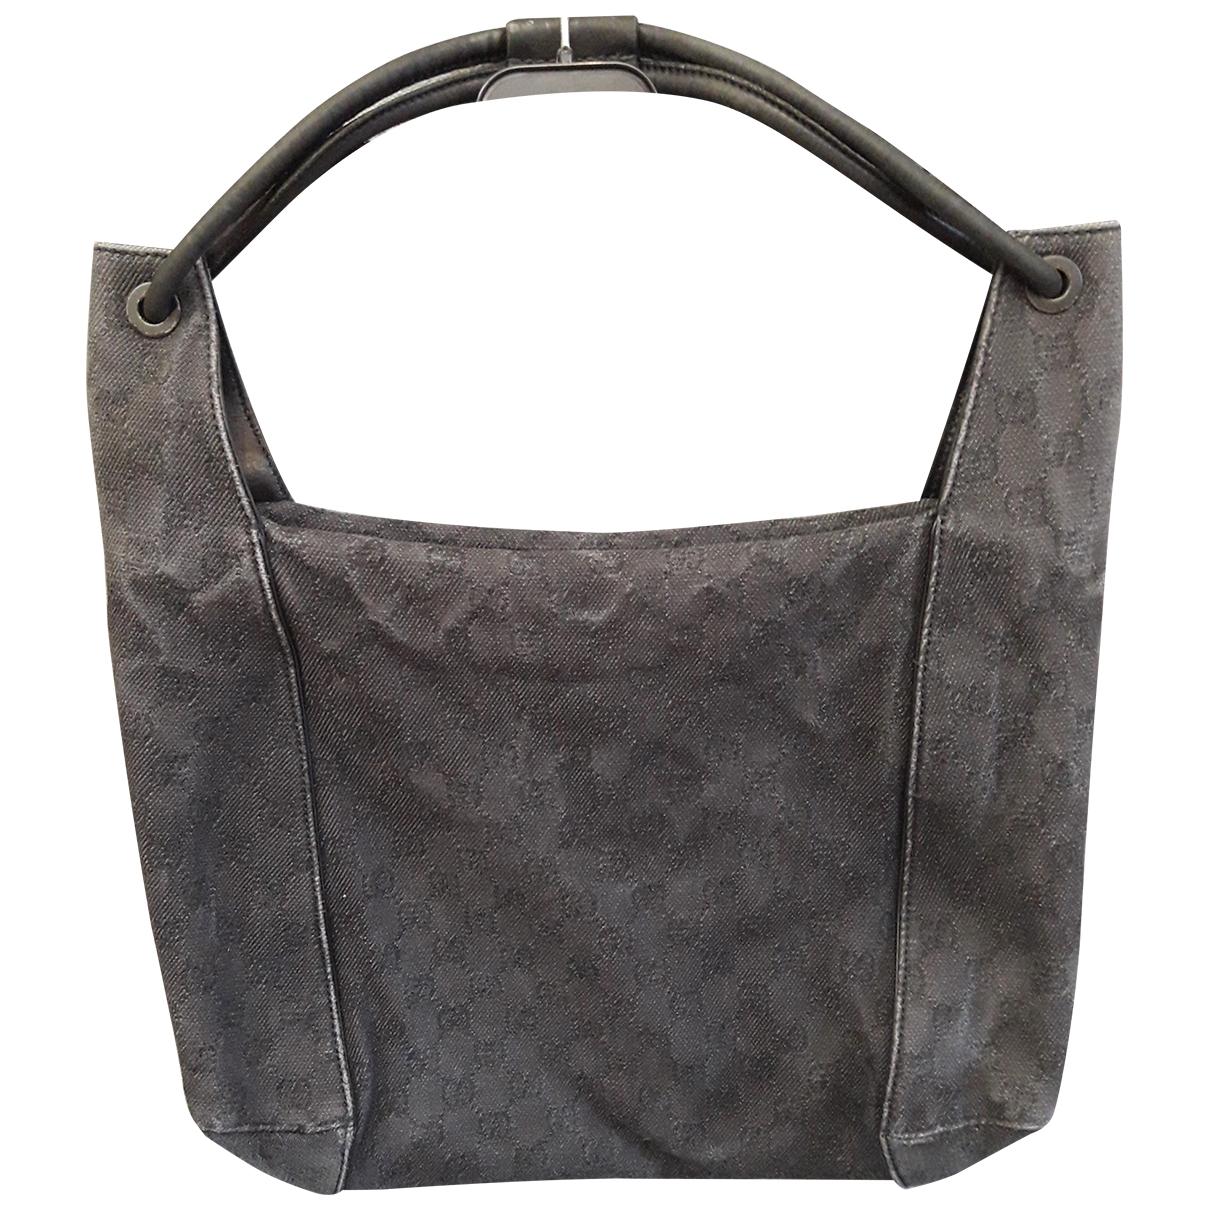 Gucci N Anthracite Cloth handbag for Women N